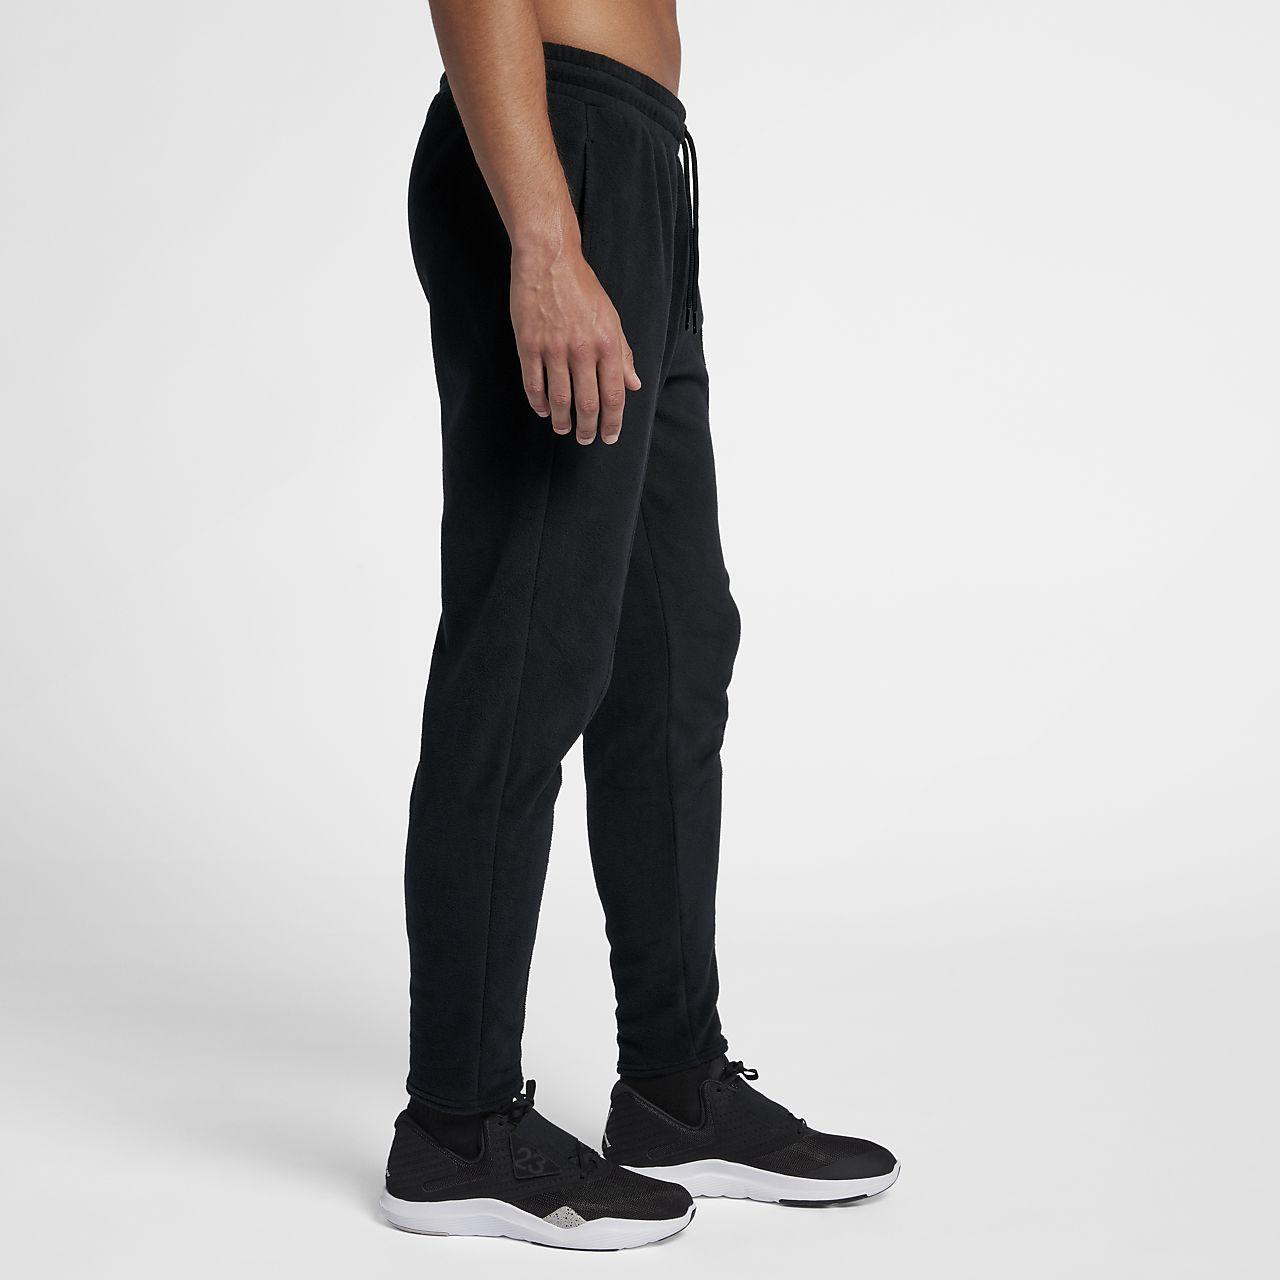 8f91f06816ed2c Jordan Therma 23 Alpha Men s Training Trousers. Nike.com BE